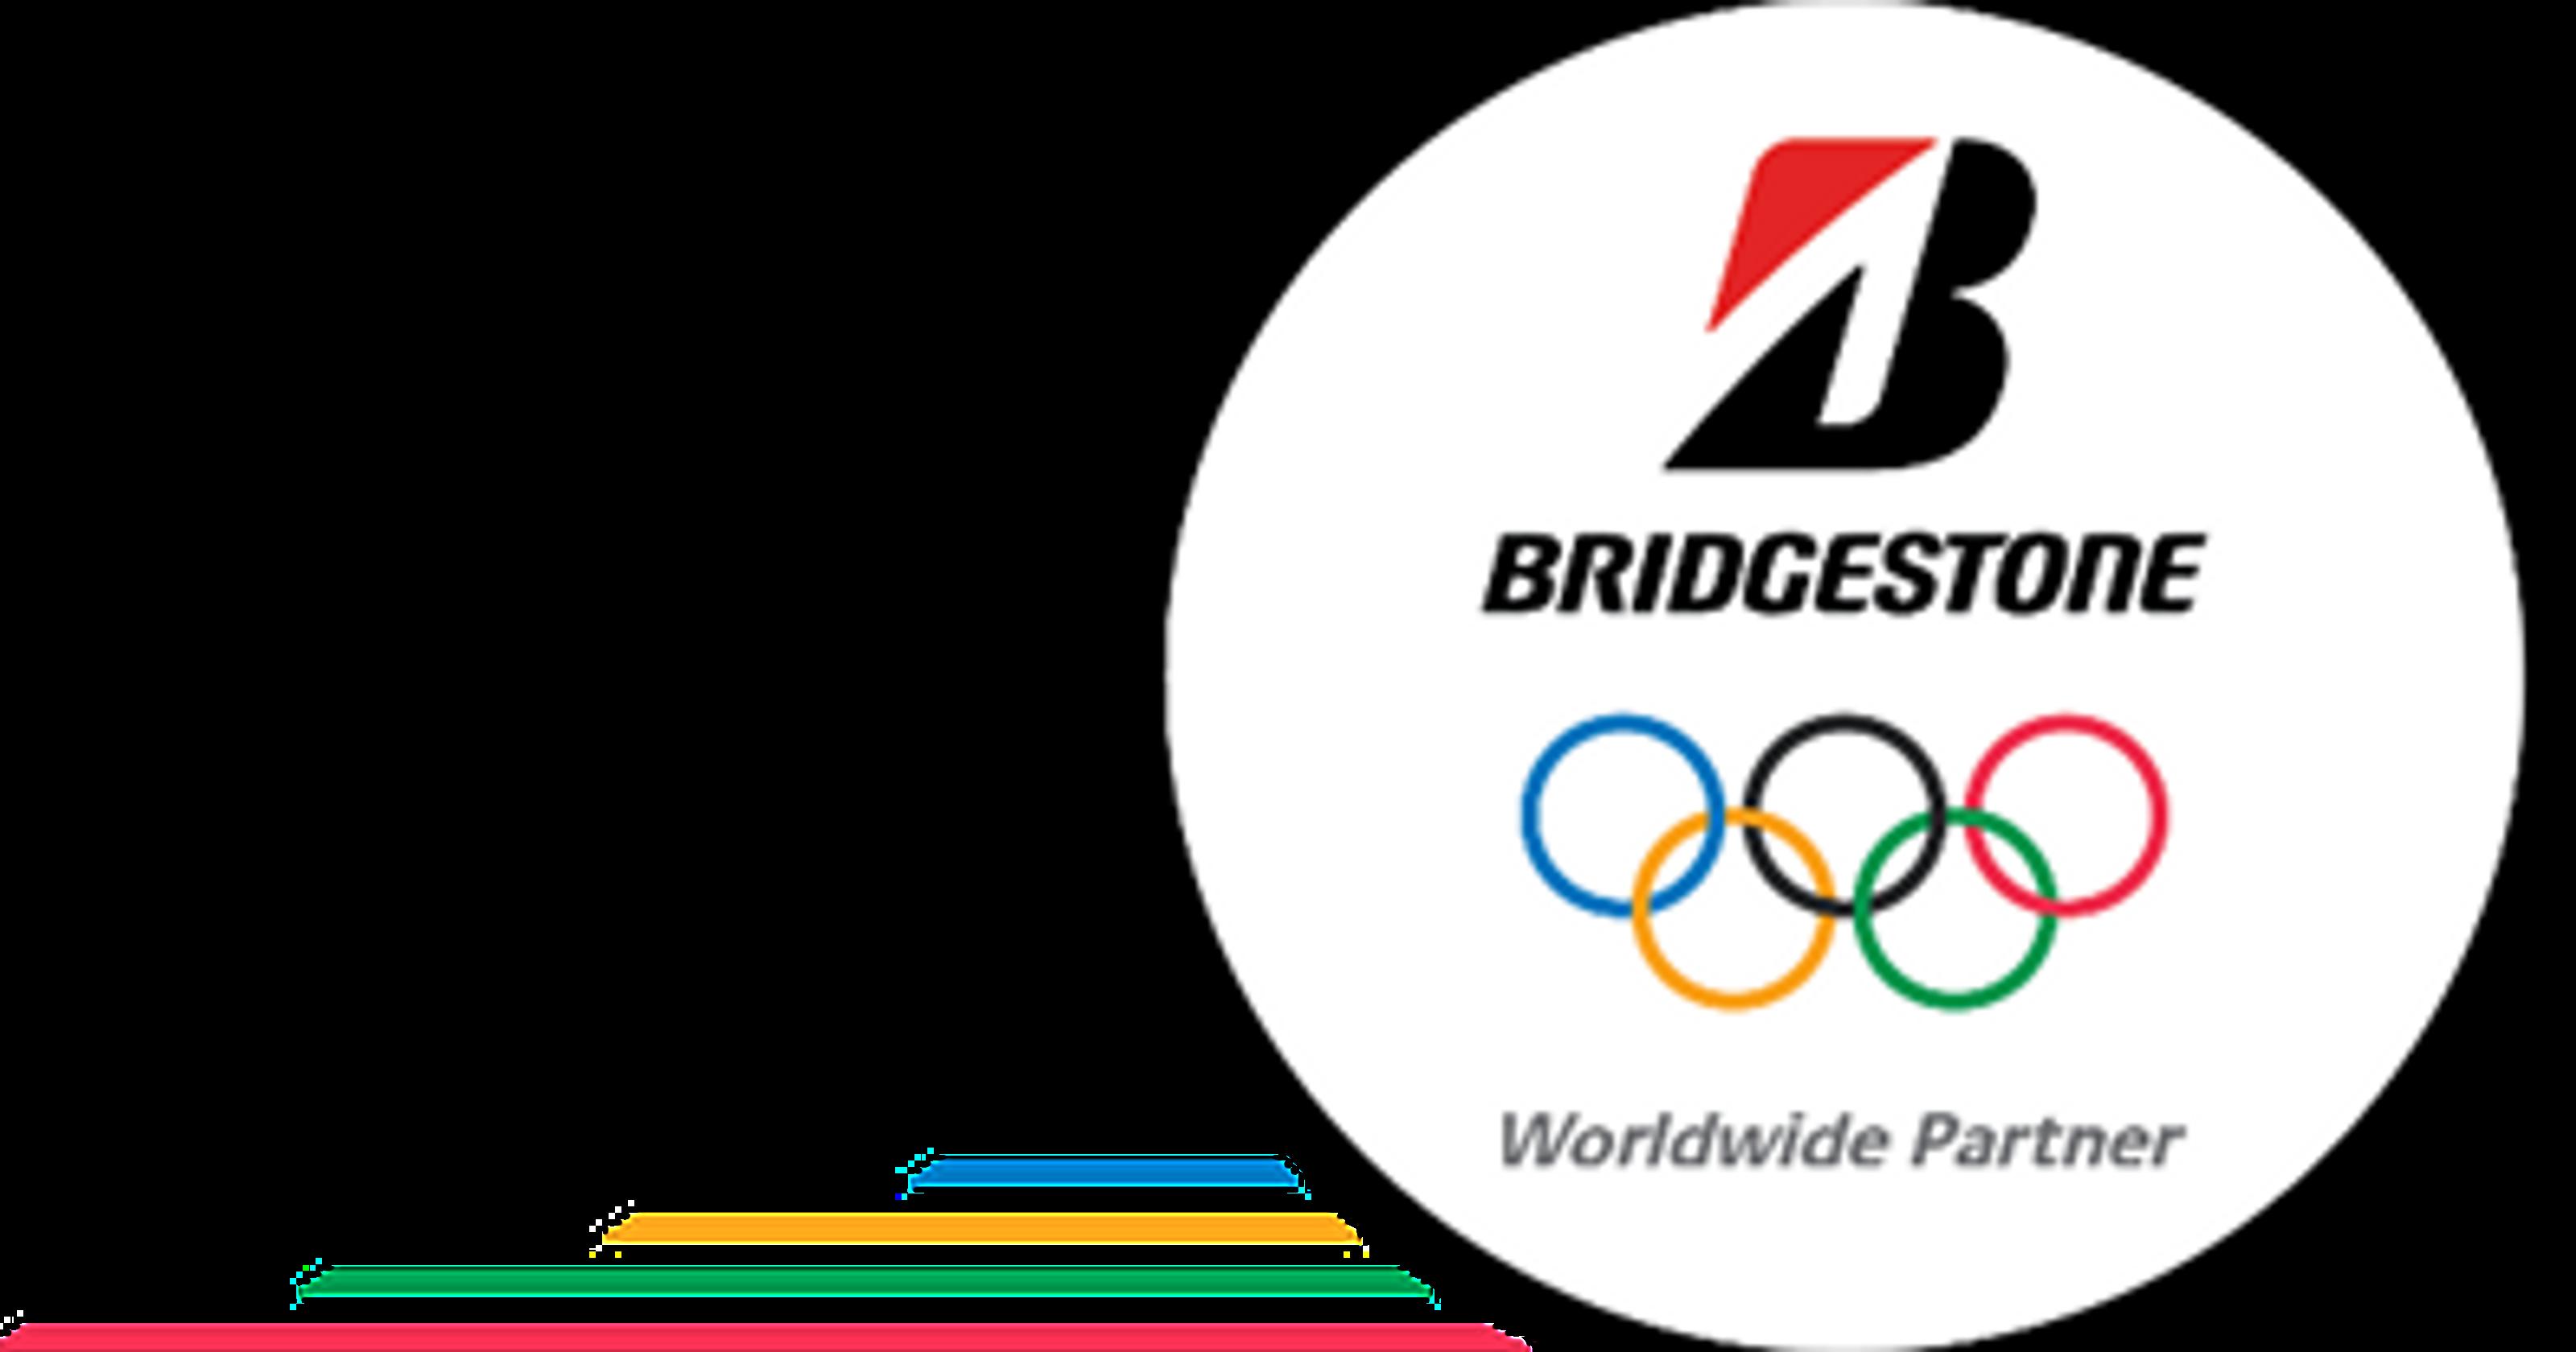 Bridgestone takes marketing global with Olympics campaign.